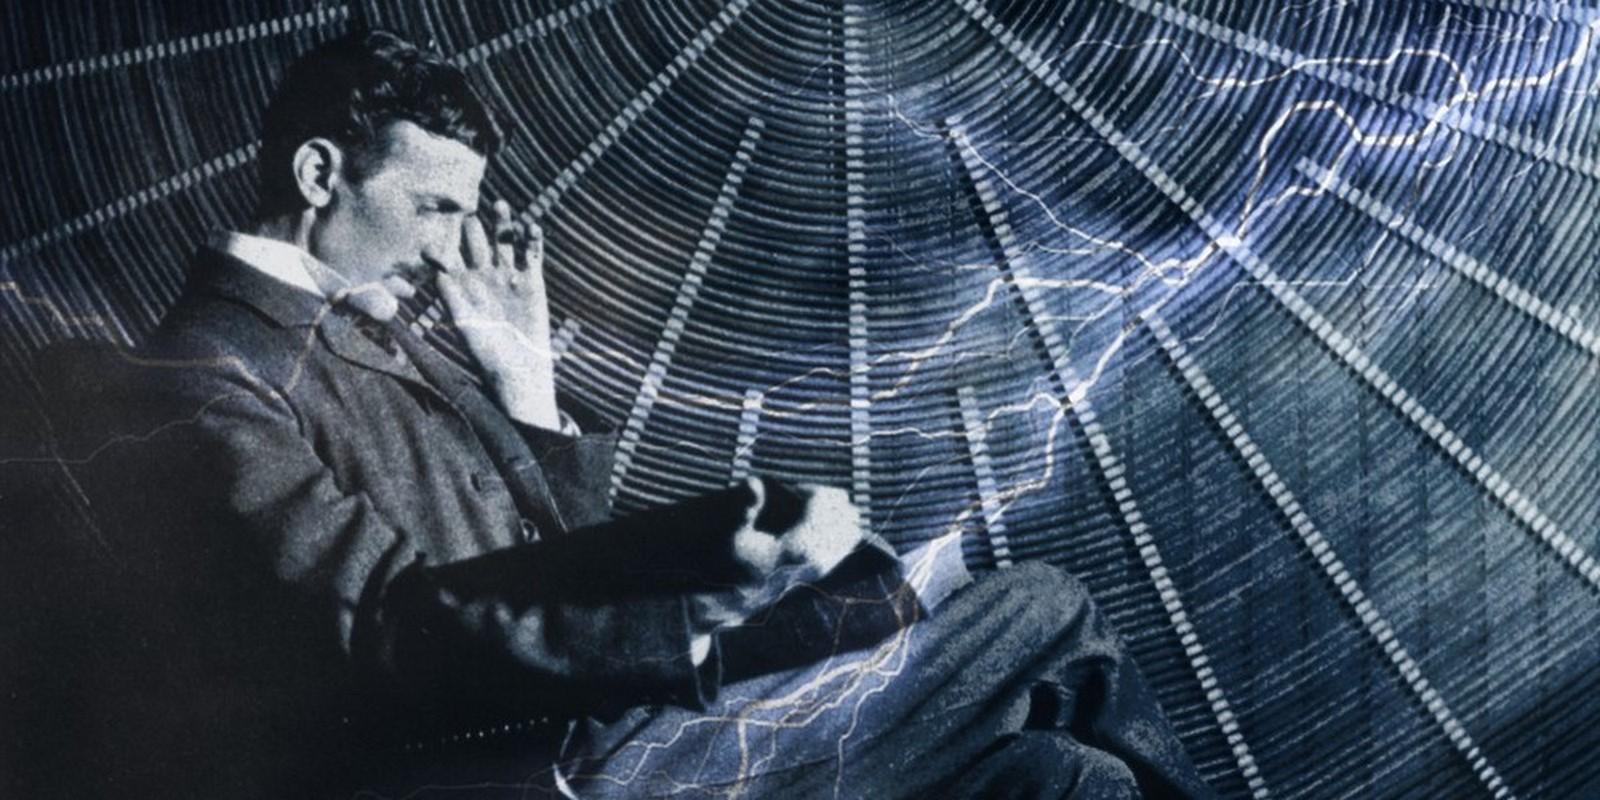 Nikola Tesla as an architect - Sheet1